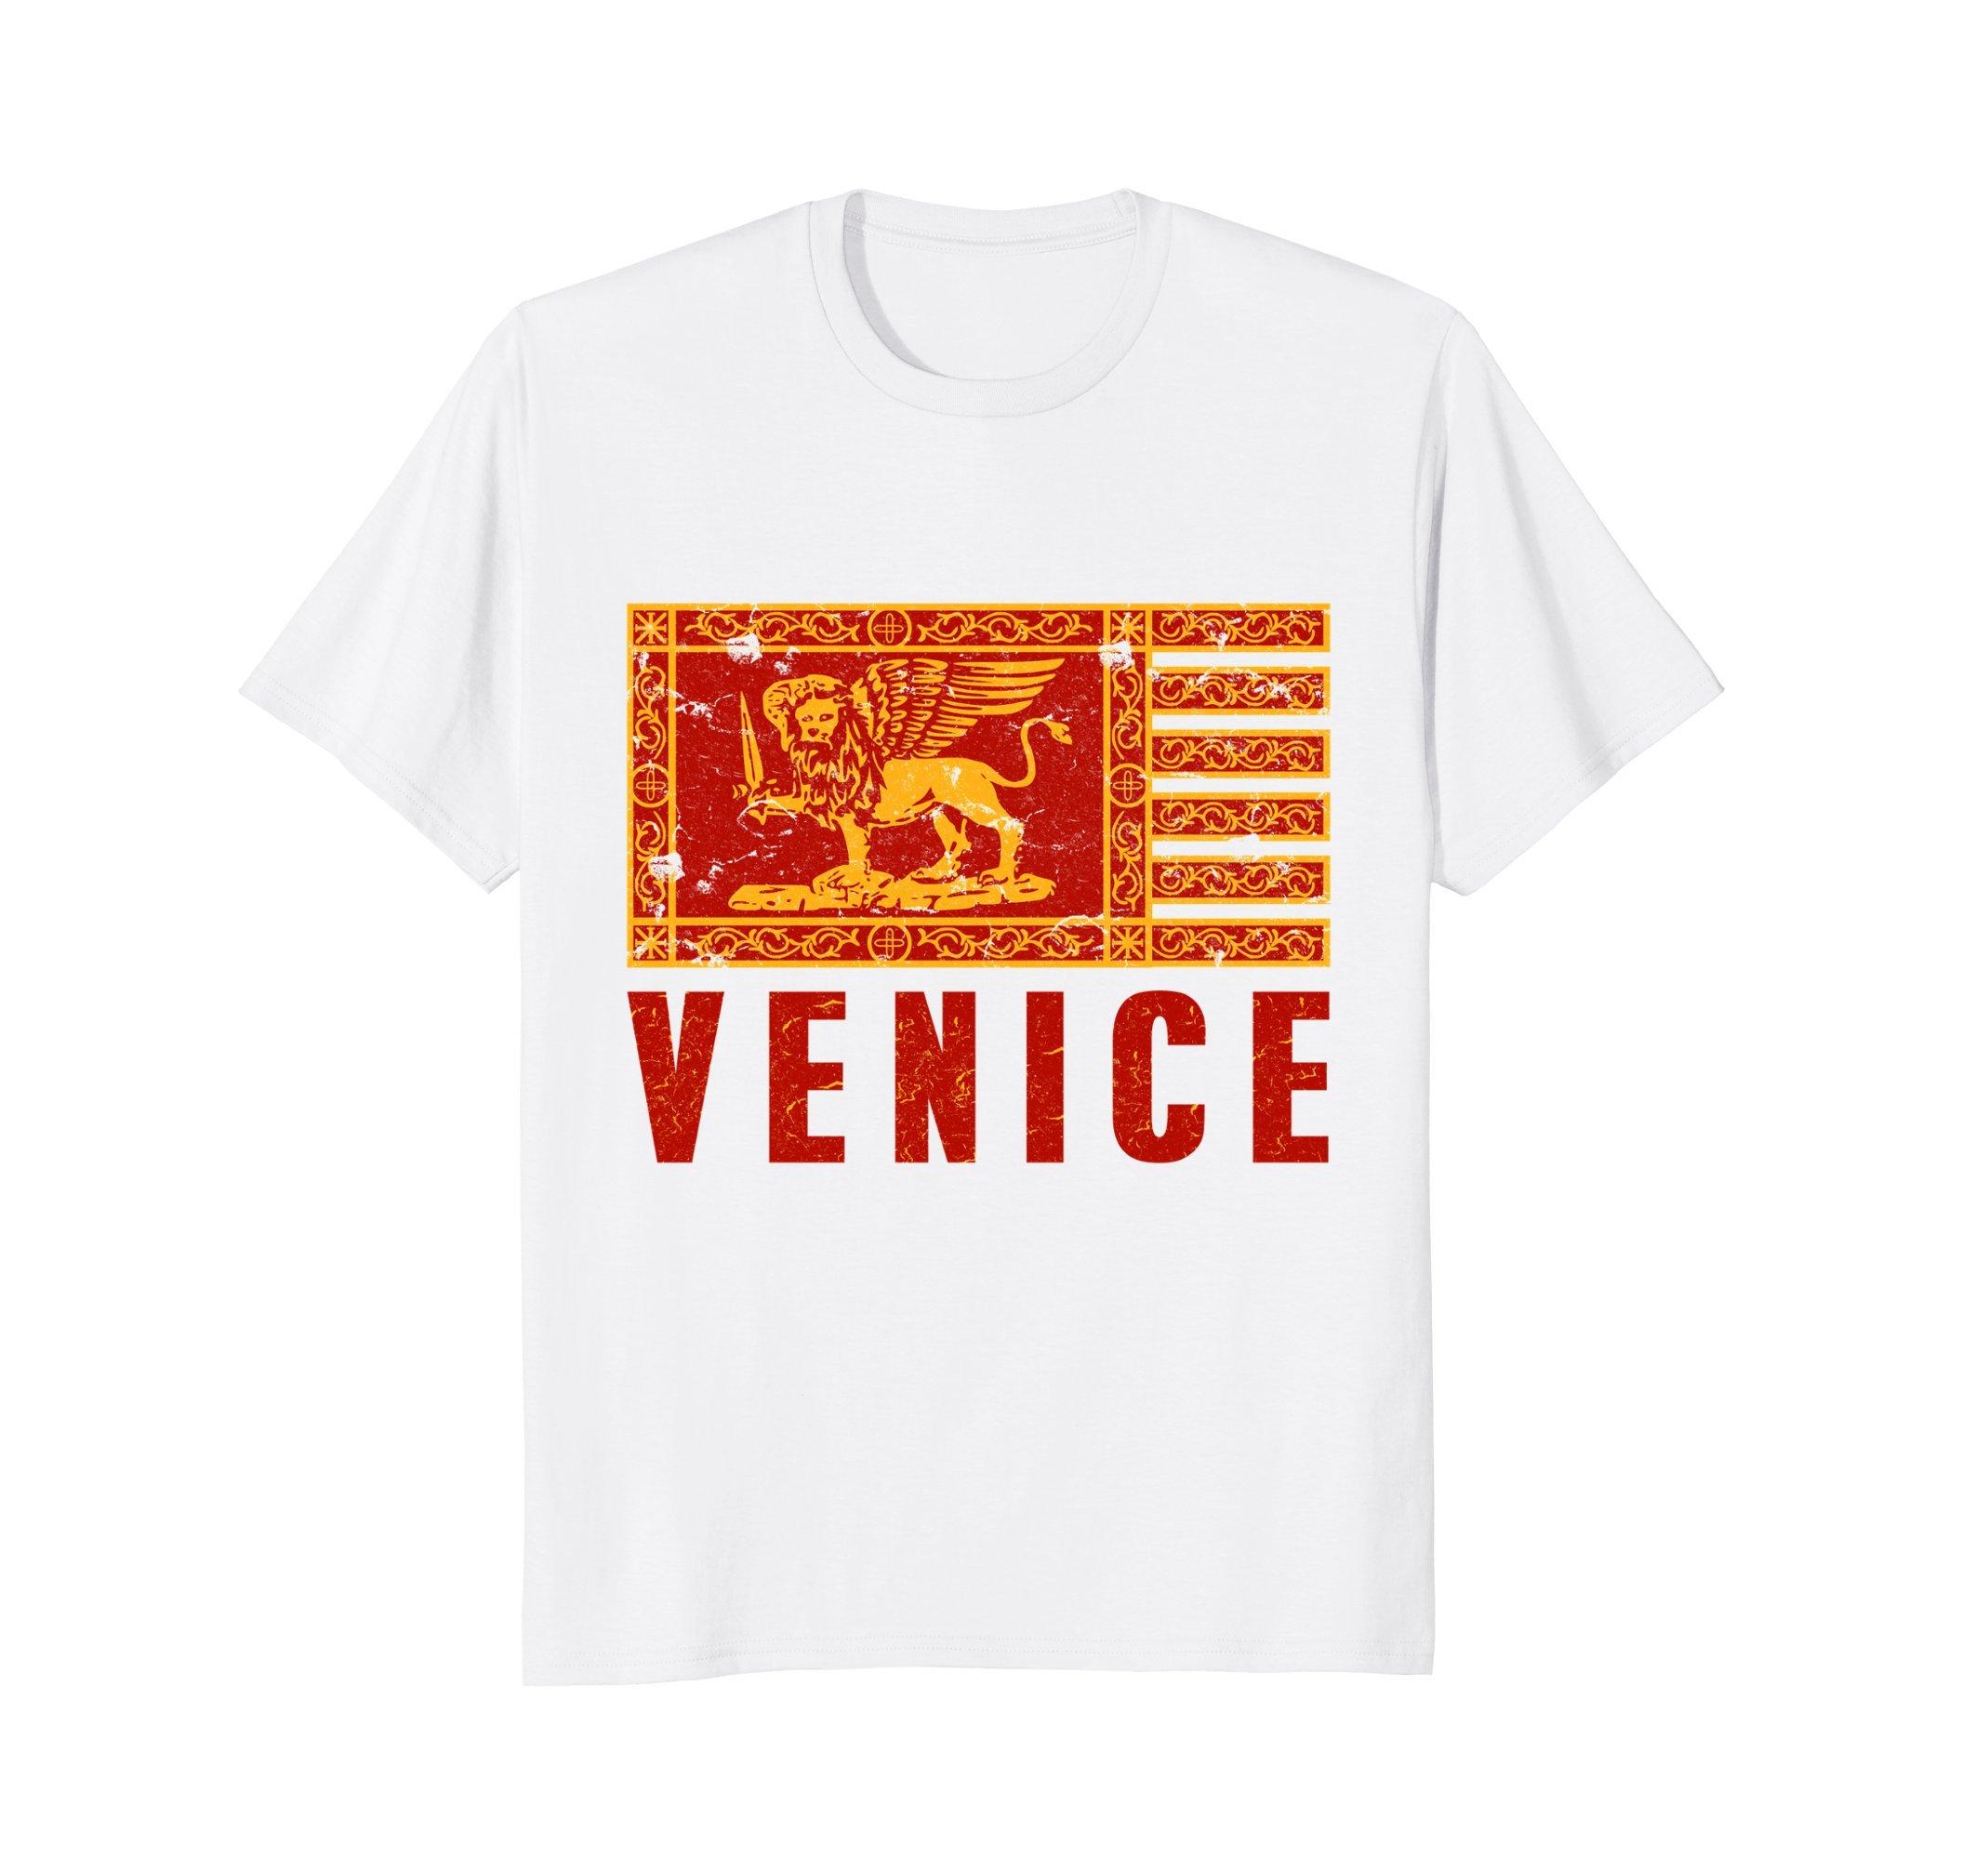 Venezia Venice Venetian War Flag Tourist Travel T-Shirt